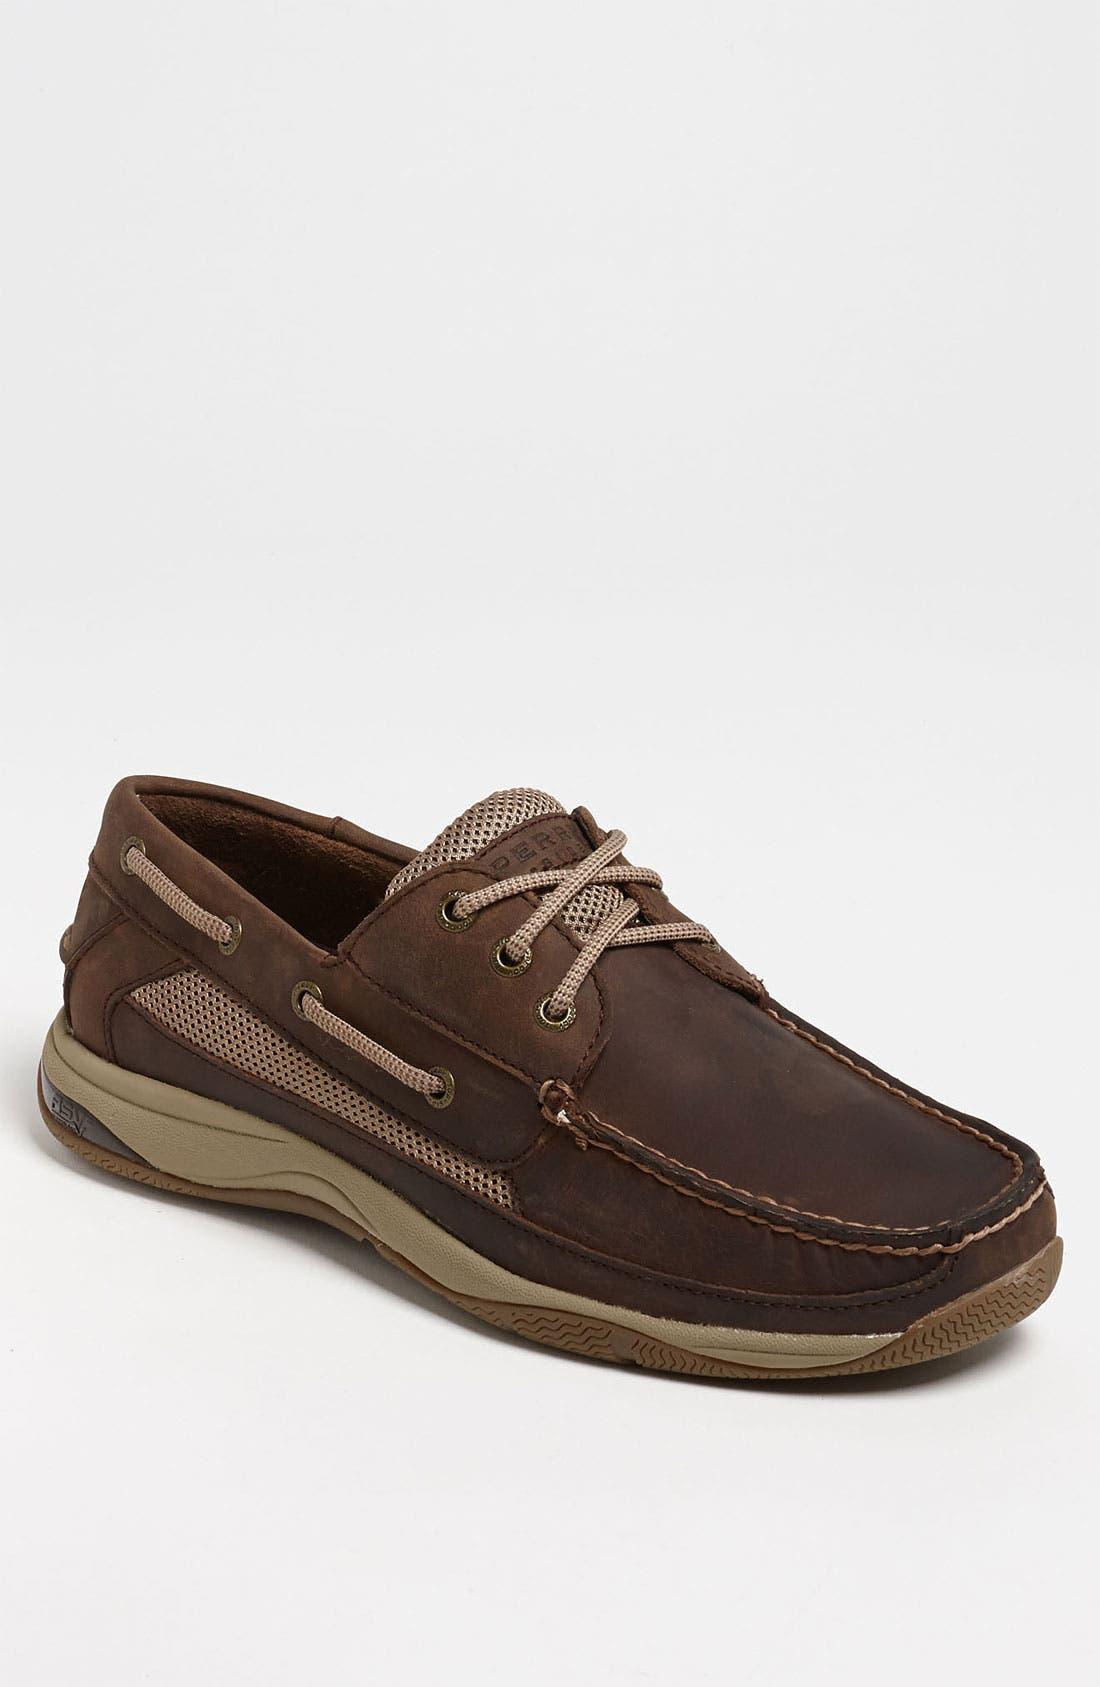 Alternate Image 1 Selected - Sperry Top-Sider® 'Billfish' Boat Shoe